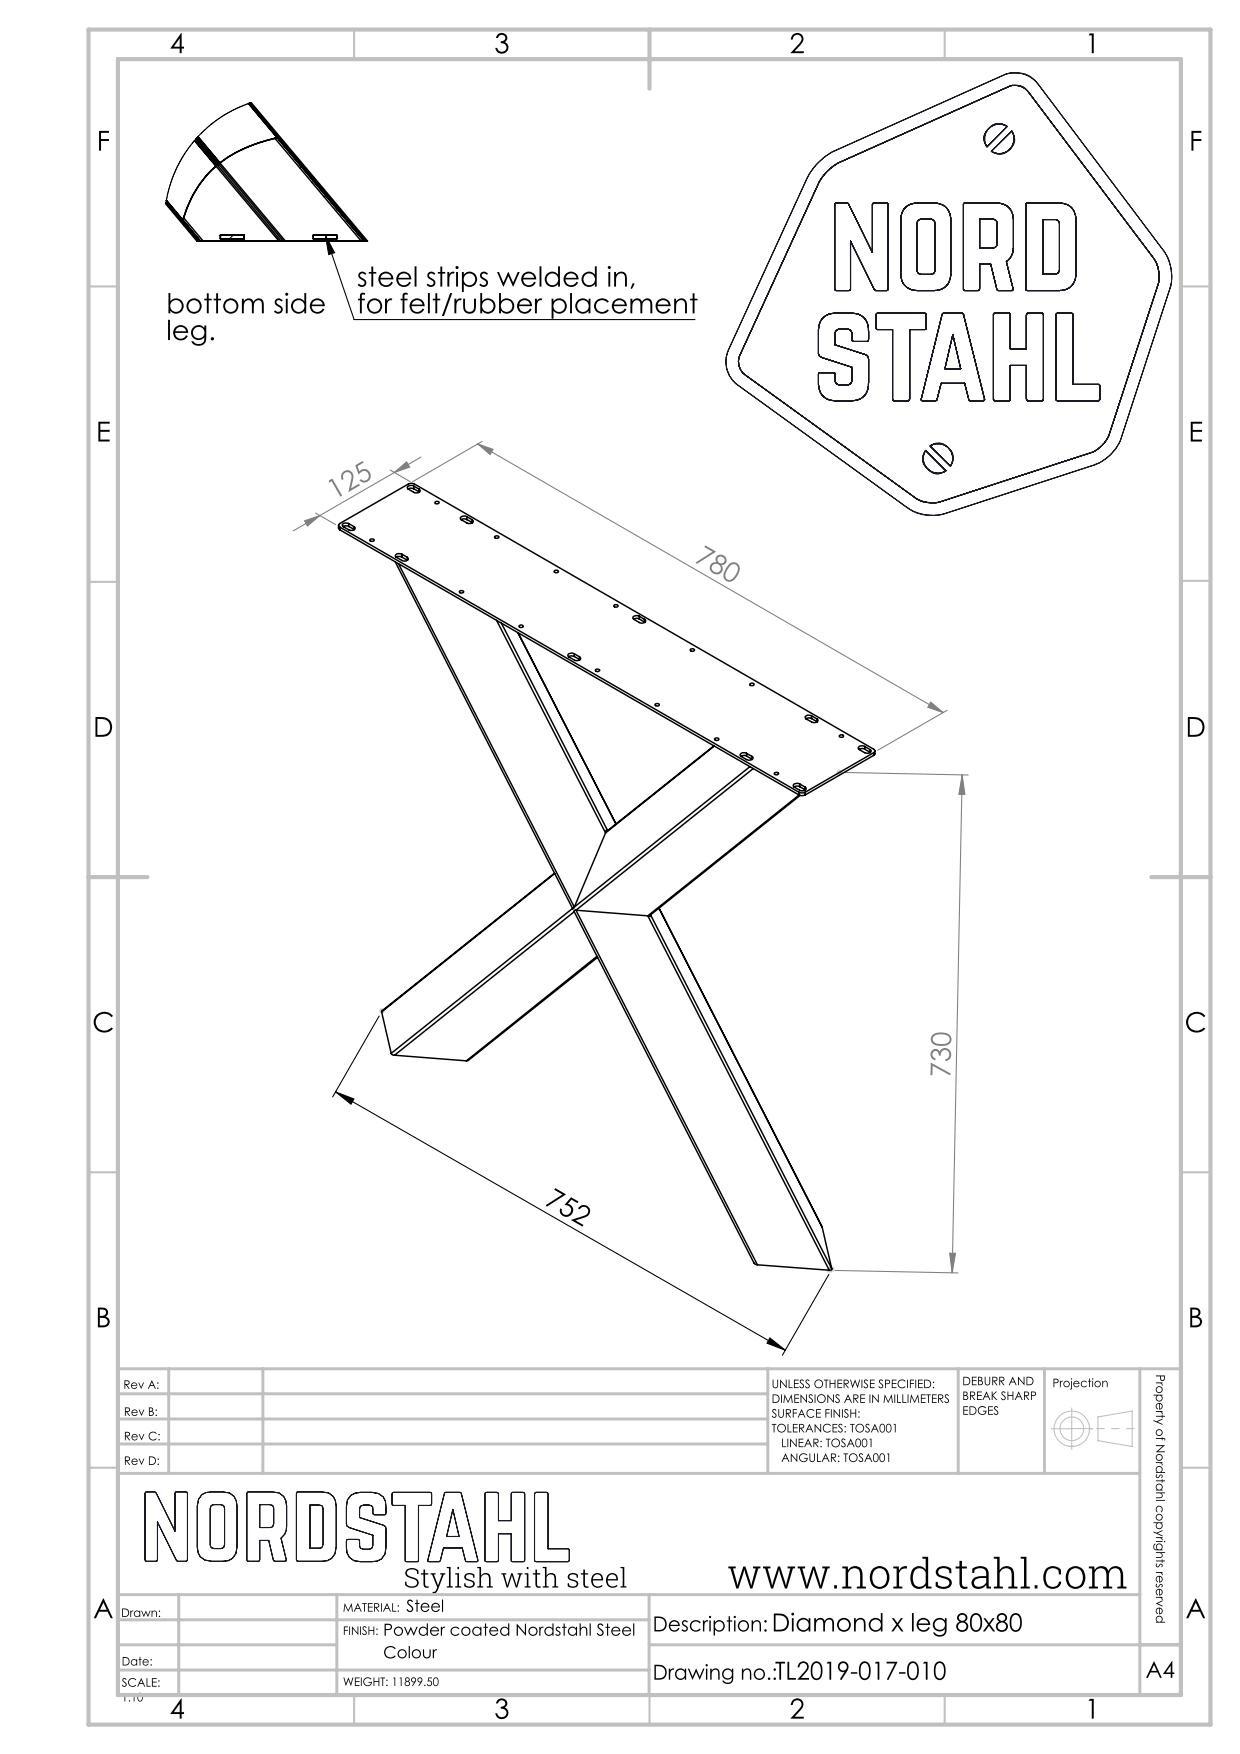 Nordstahl Diamond X leg technische tekening